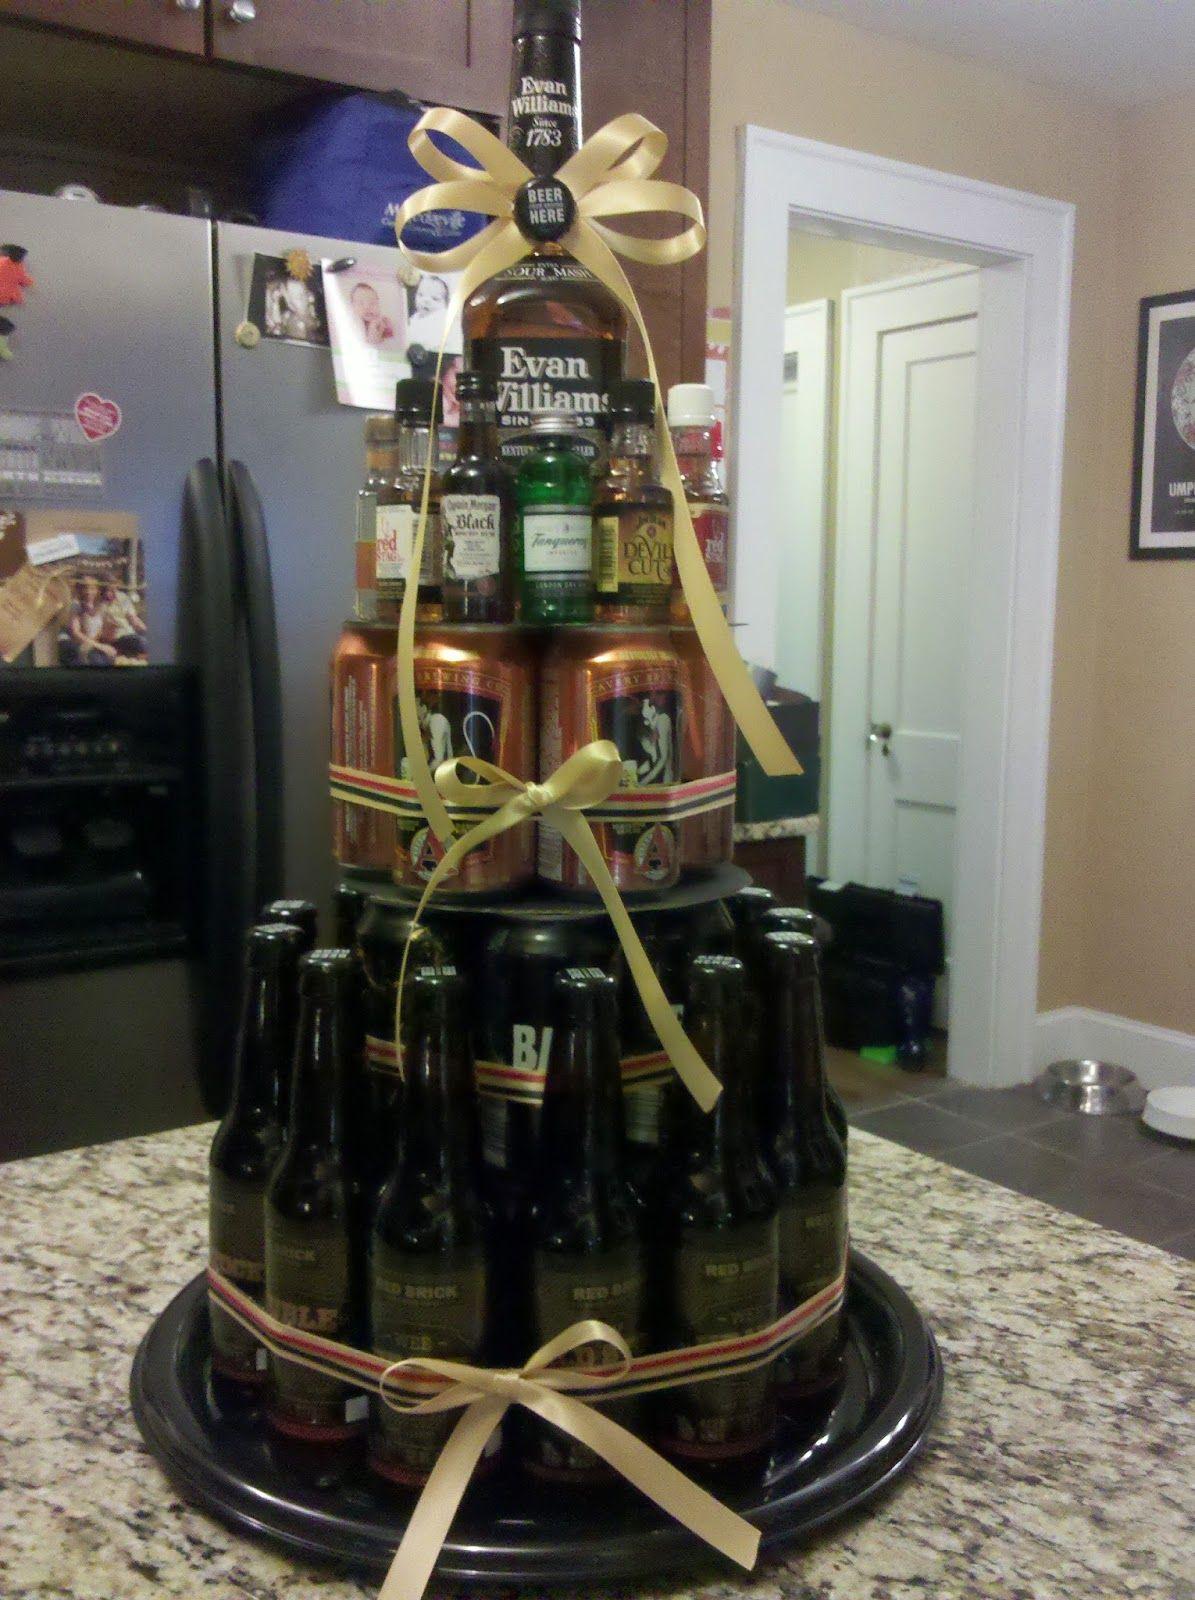 Liquor Bottle Craft Projects Booze Cake Art N Crafts I